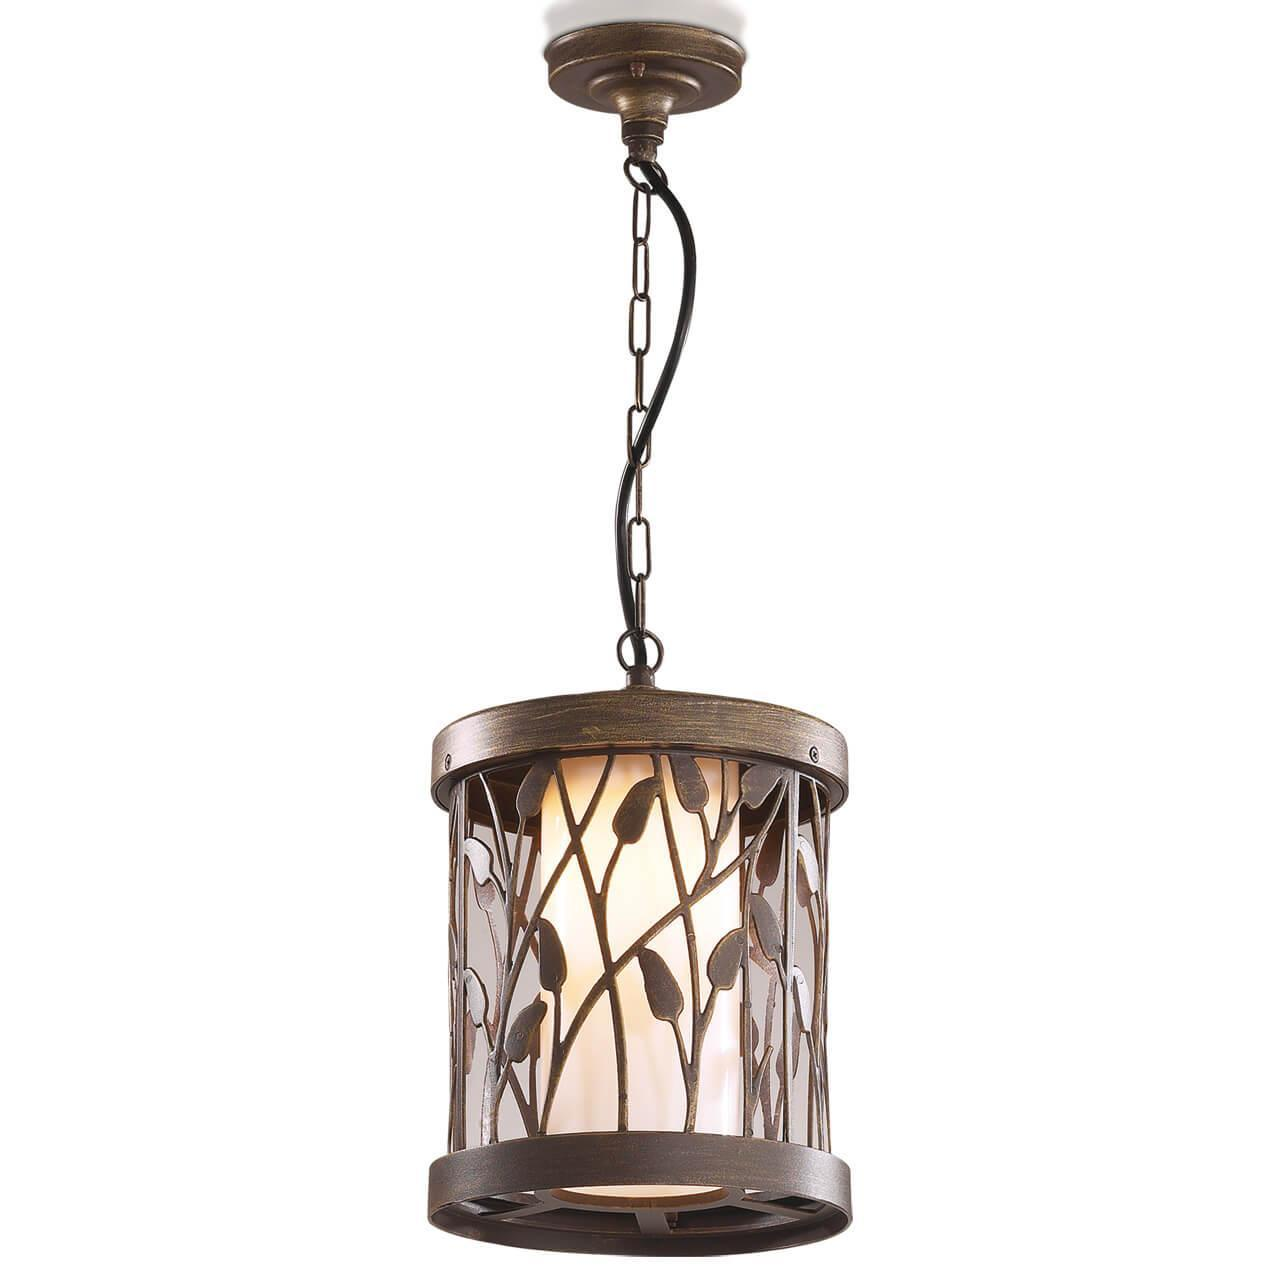 Уличный светильник Odeon Light 2287/1, E27 цена